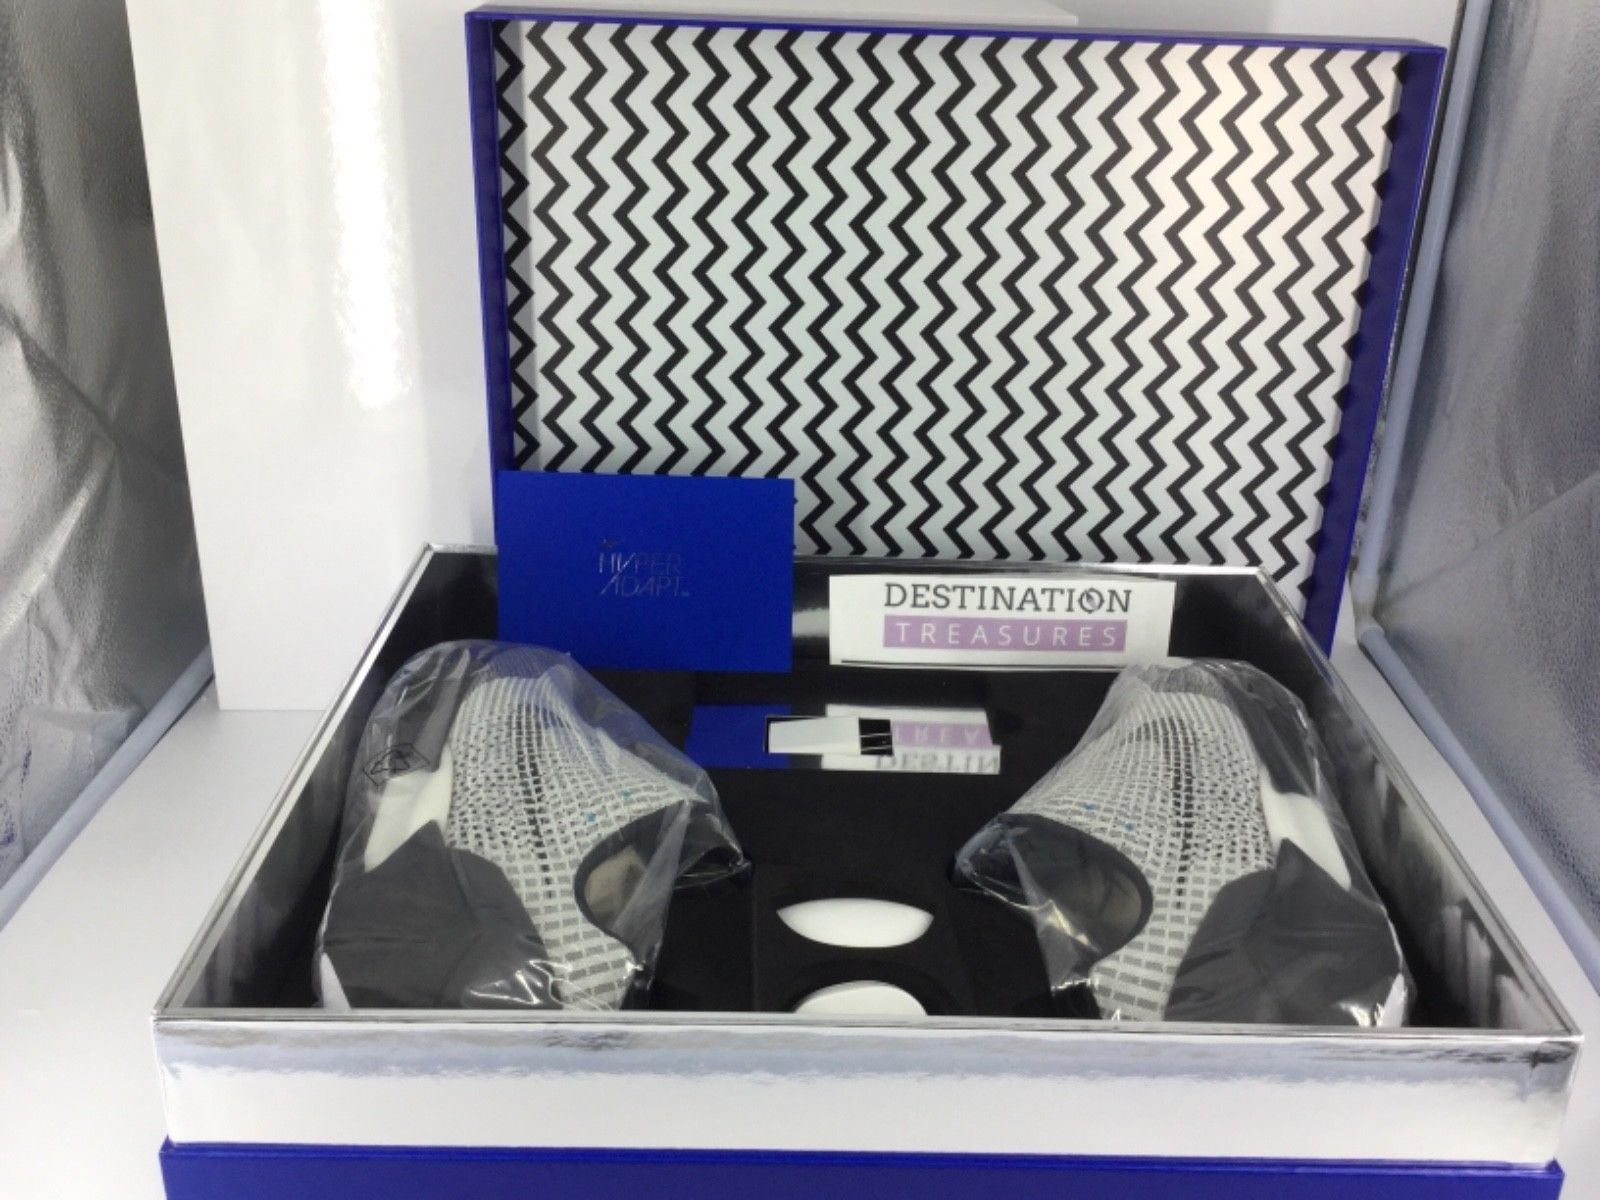 Nike HyperAdapt 1.0 EARL Sneakers Sz 9 Men Metallic Silver Authentic Hyper  Adapt